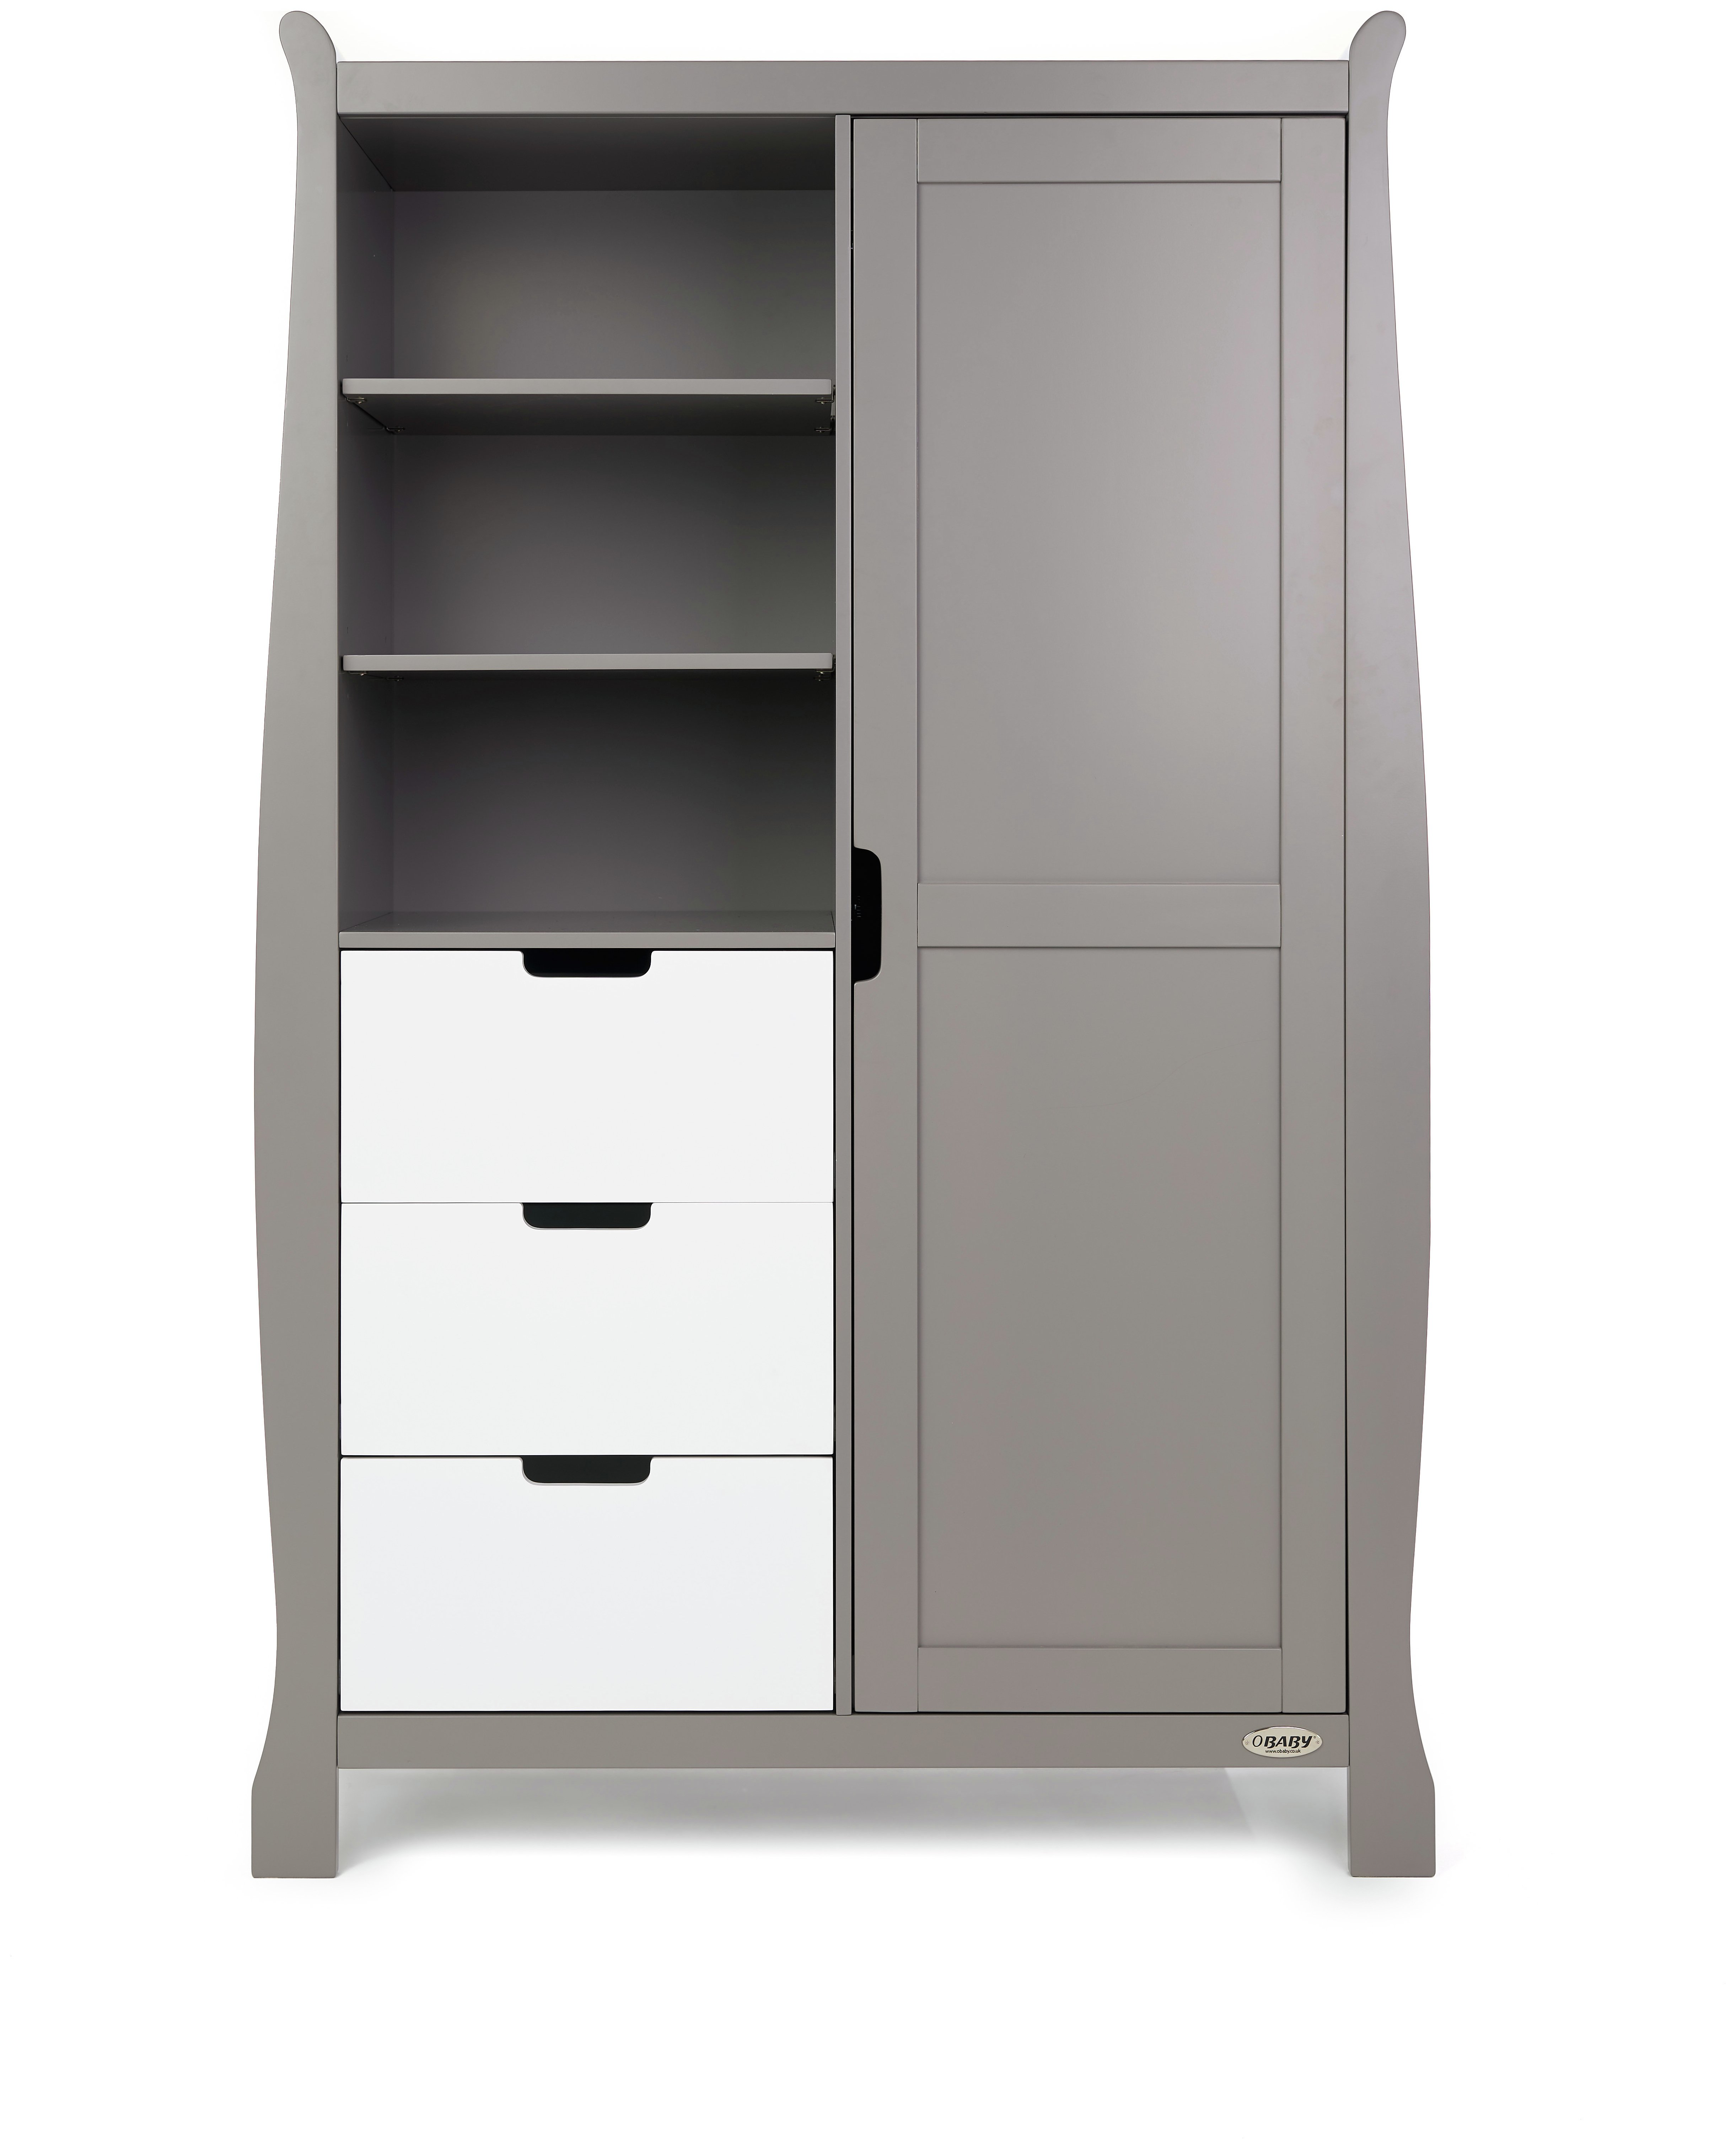 Image of Obaby Stamford Sleigh Double Wardrobe - Taupe Grey & White